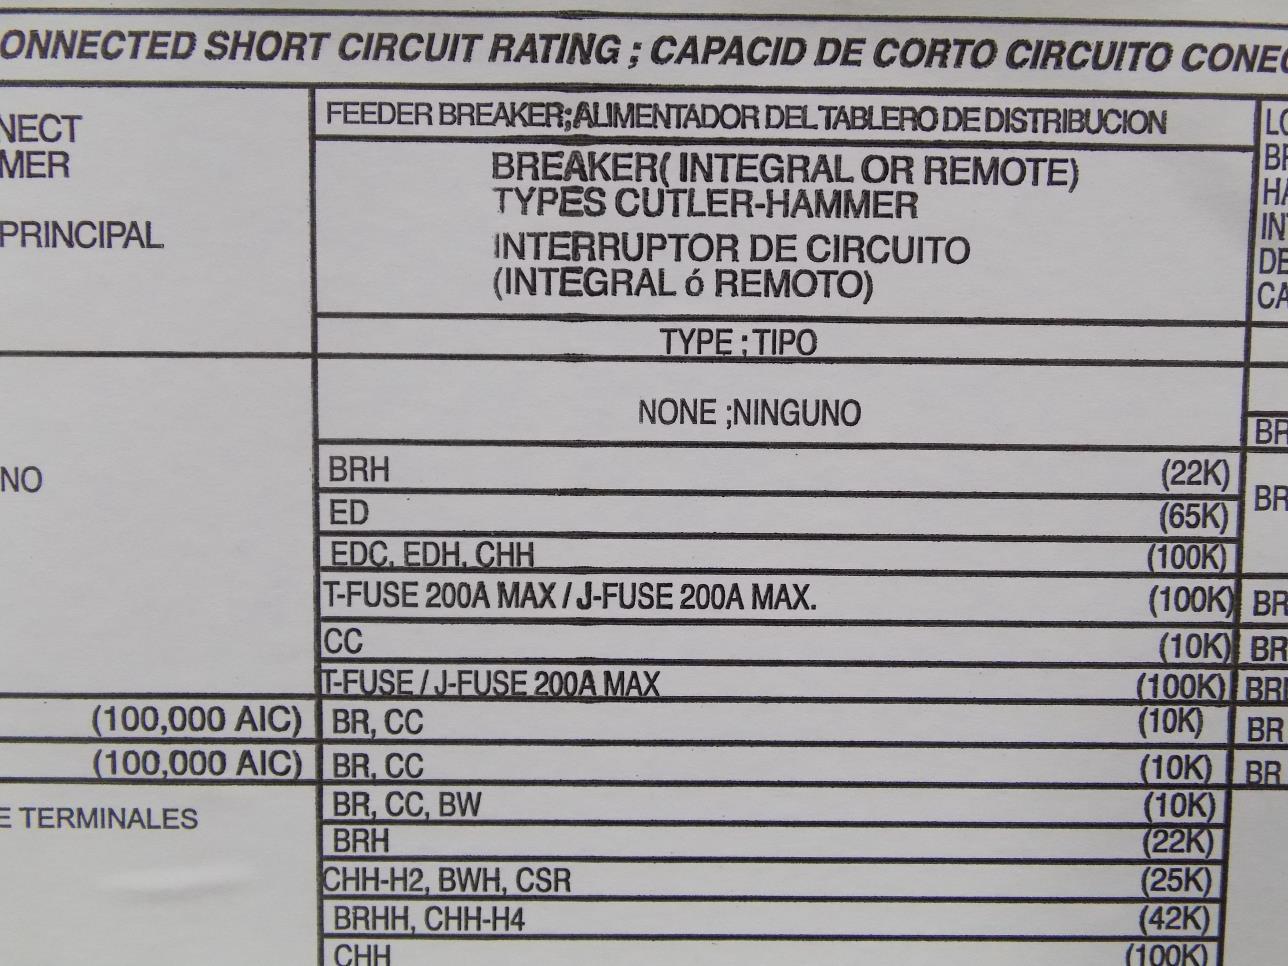 CUTLER-HAMMER 225AMP 240VAC 3PHASE 3W MAIN BREAKER